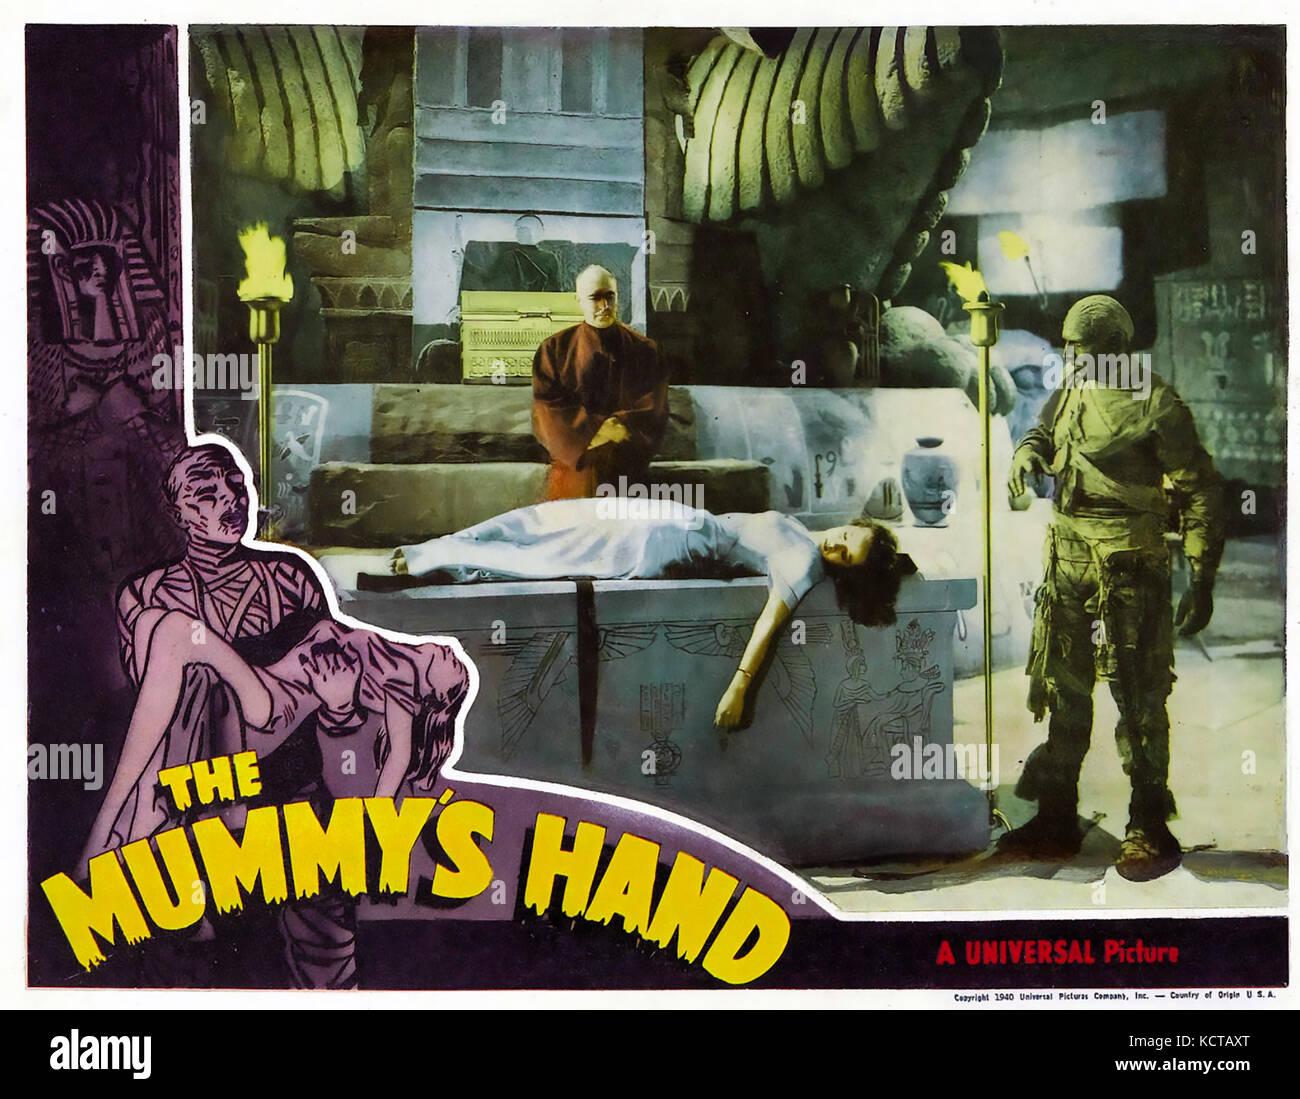 THE MUMMY'S HAND 1940 Universal Studios horror film with Peggy Moran - Stock Image